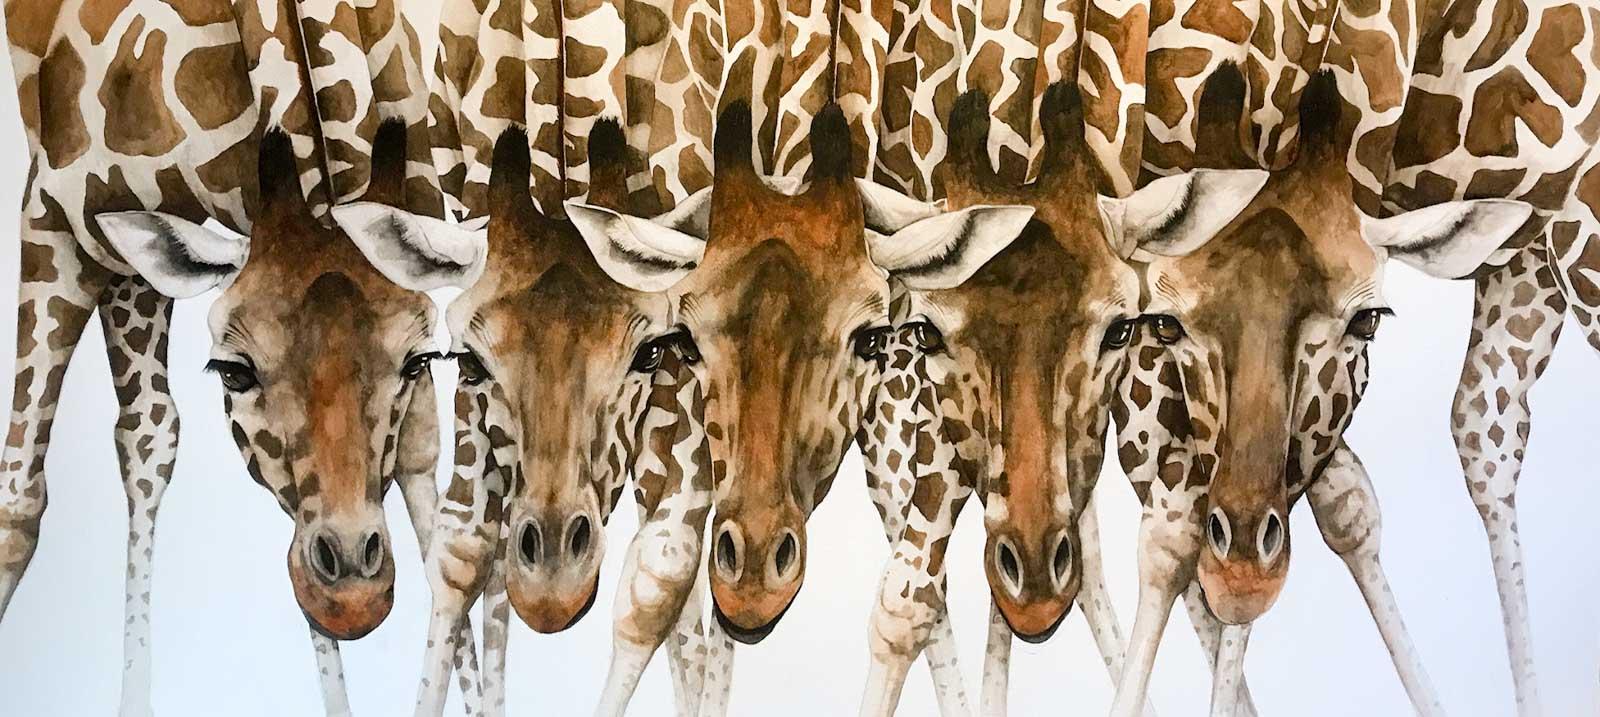 Drinking Problem, Giraffes, Dominique Salm